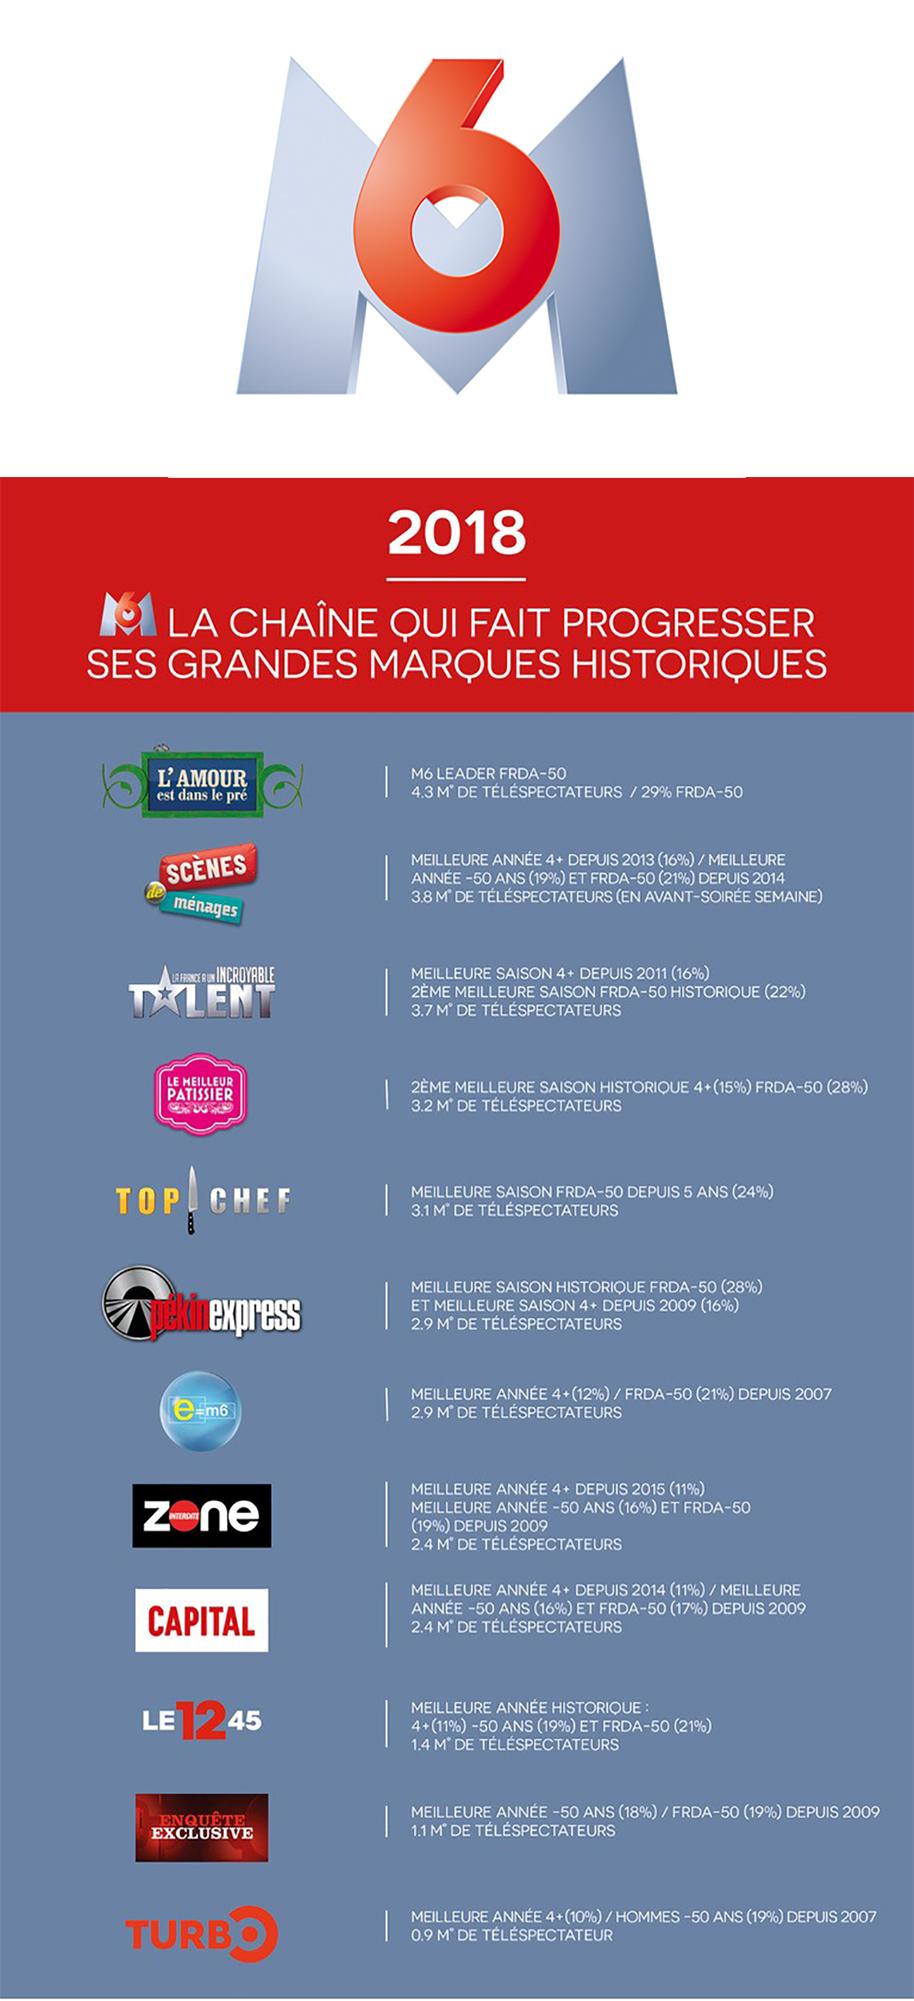 M6 la chaîne qui fait progresser ses grandes marques historiques